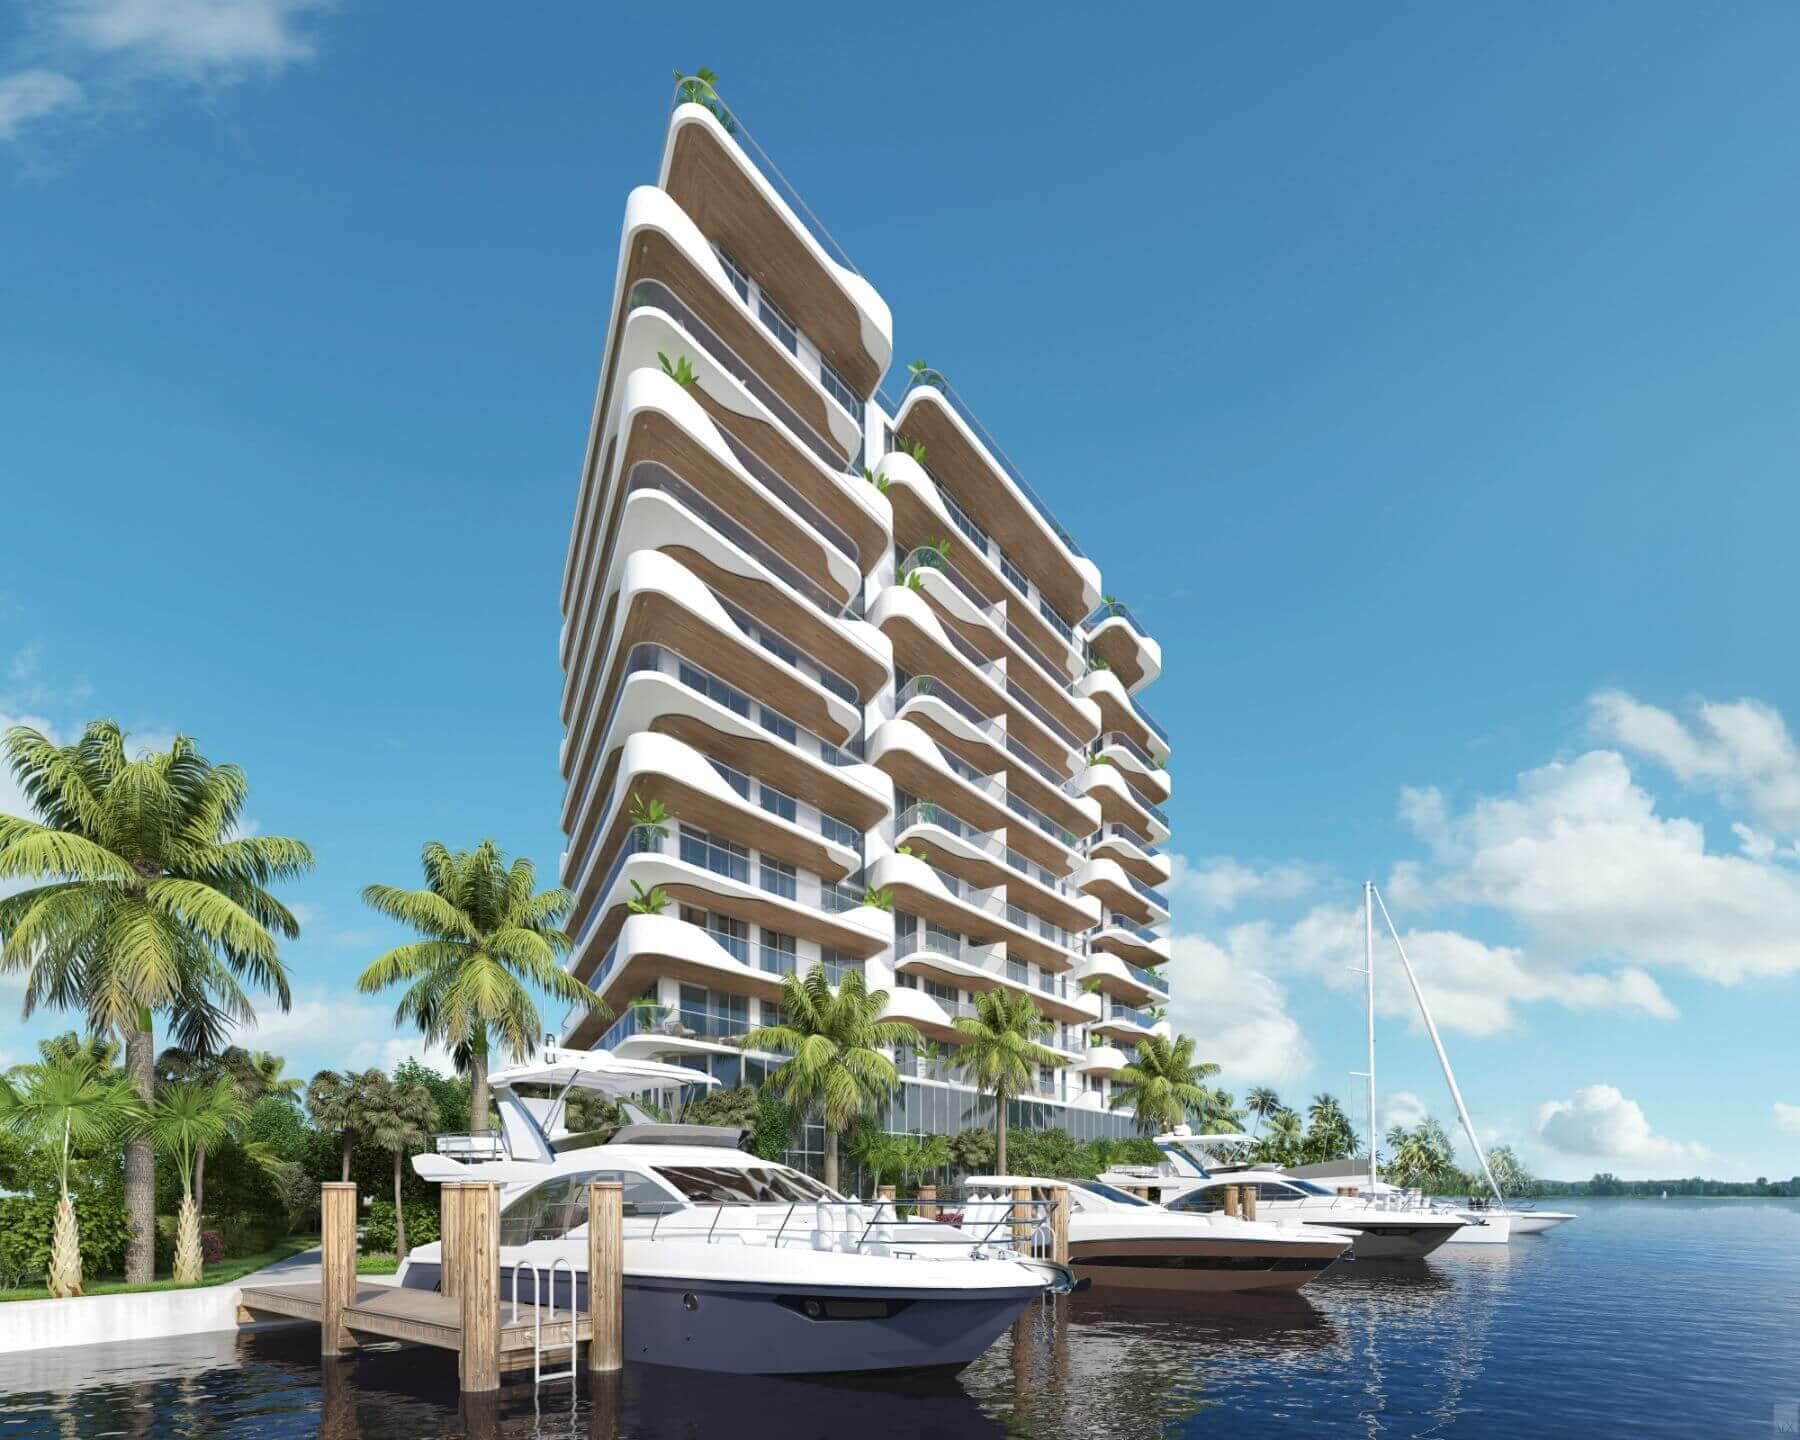 2 Monaco Yacht Club Residences